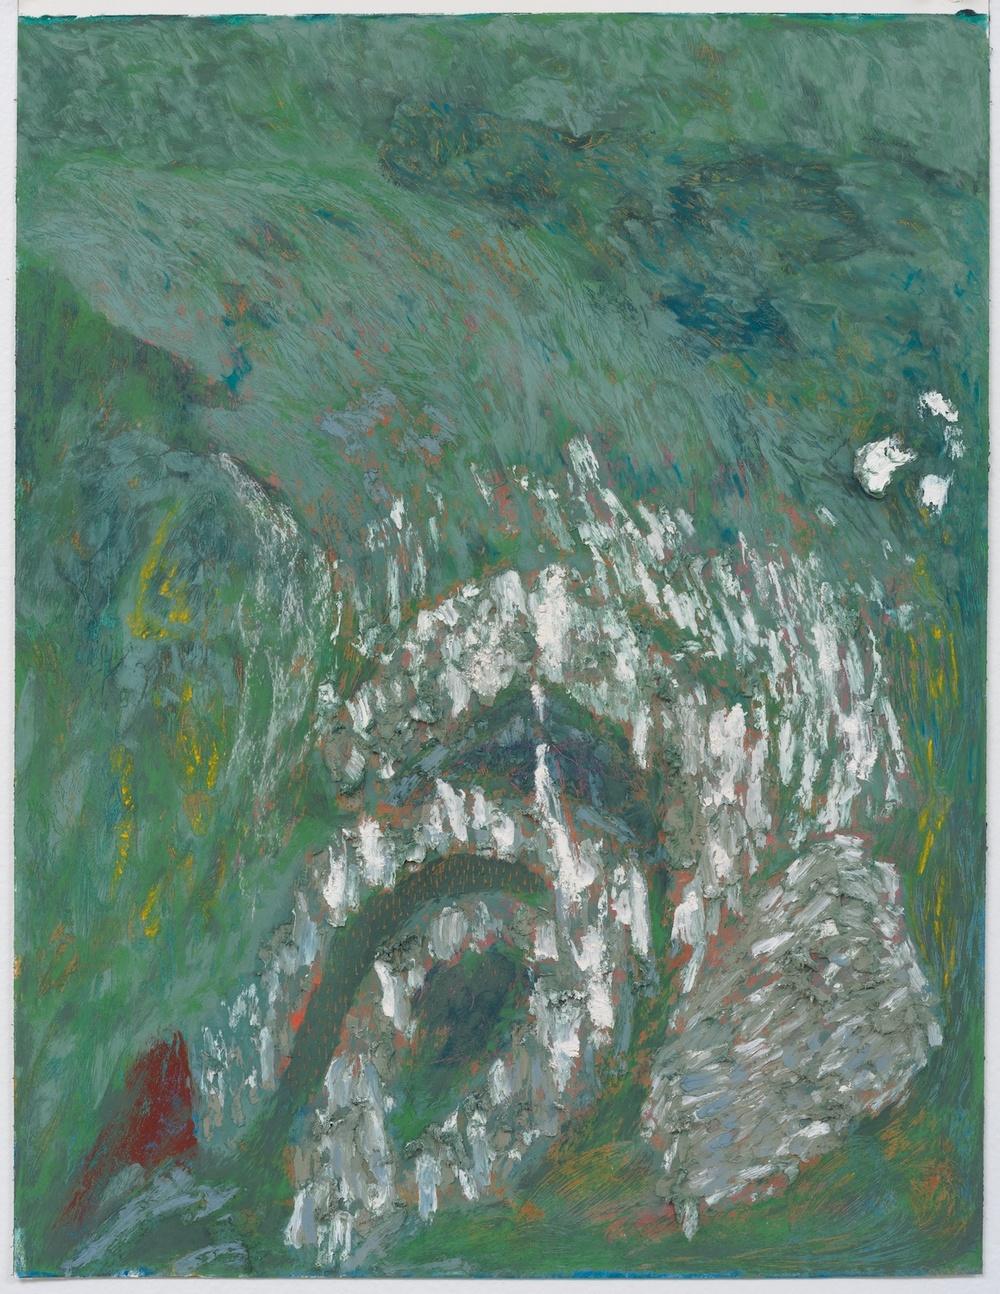 Mimi Lauter  The Goose (Miniature)  2015 Soft pastel, oil pastel on paper 18 ½h x 14 ⅛w in (artwork); 22 ½h x 18 ½w x 1 ¾d in (framed) MLaut017